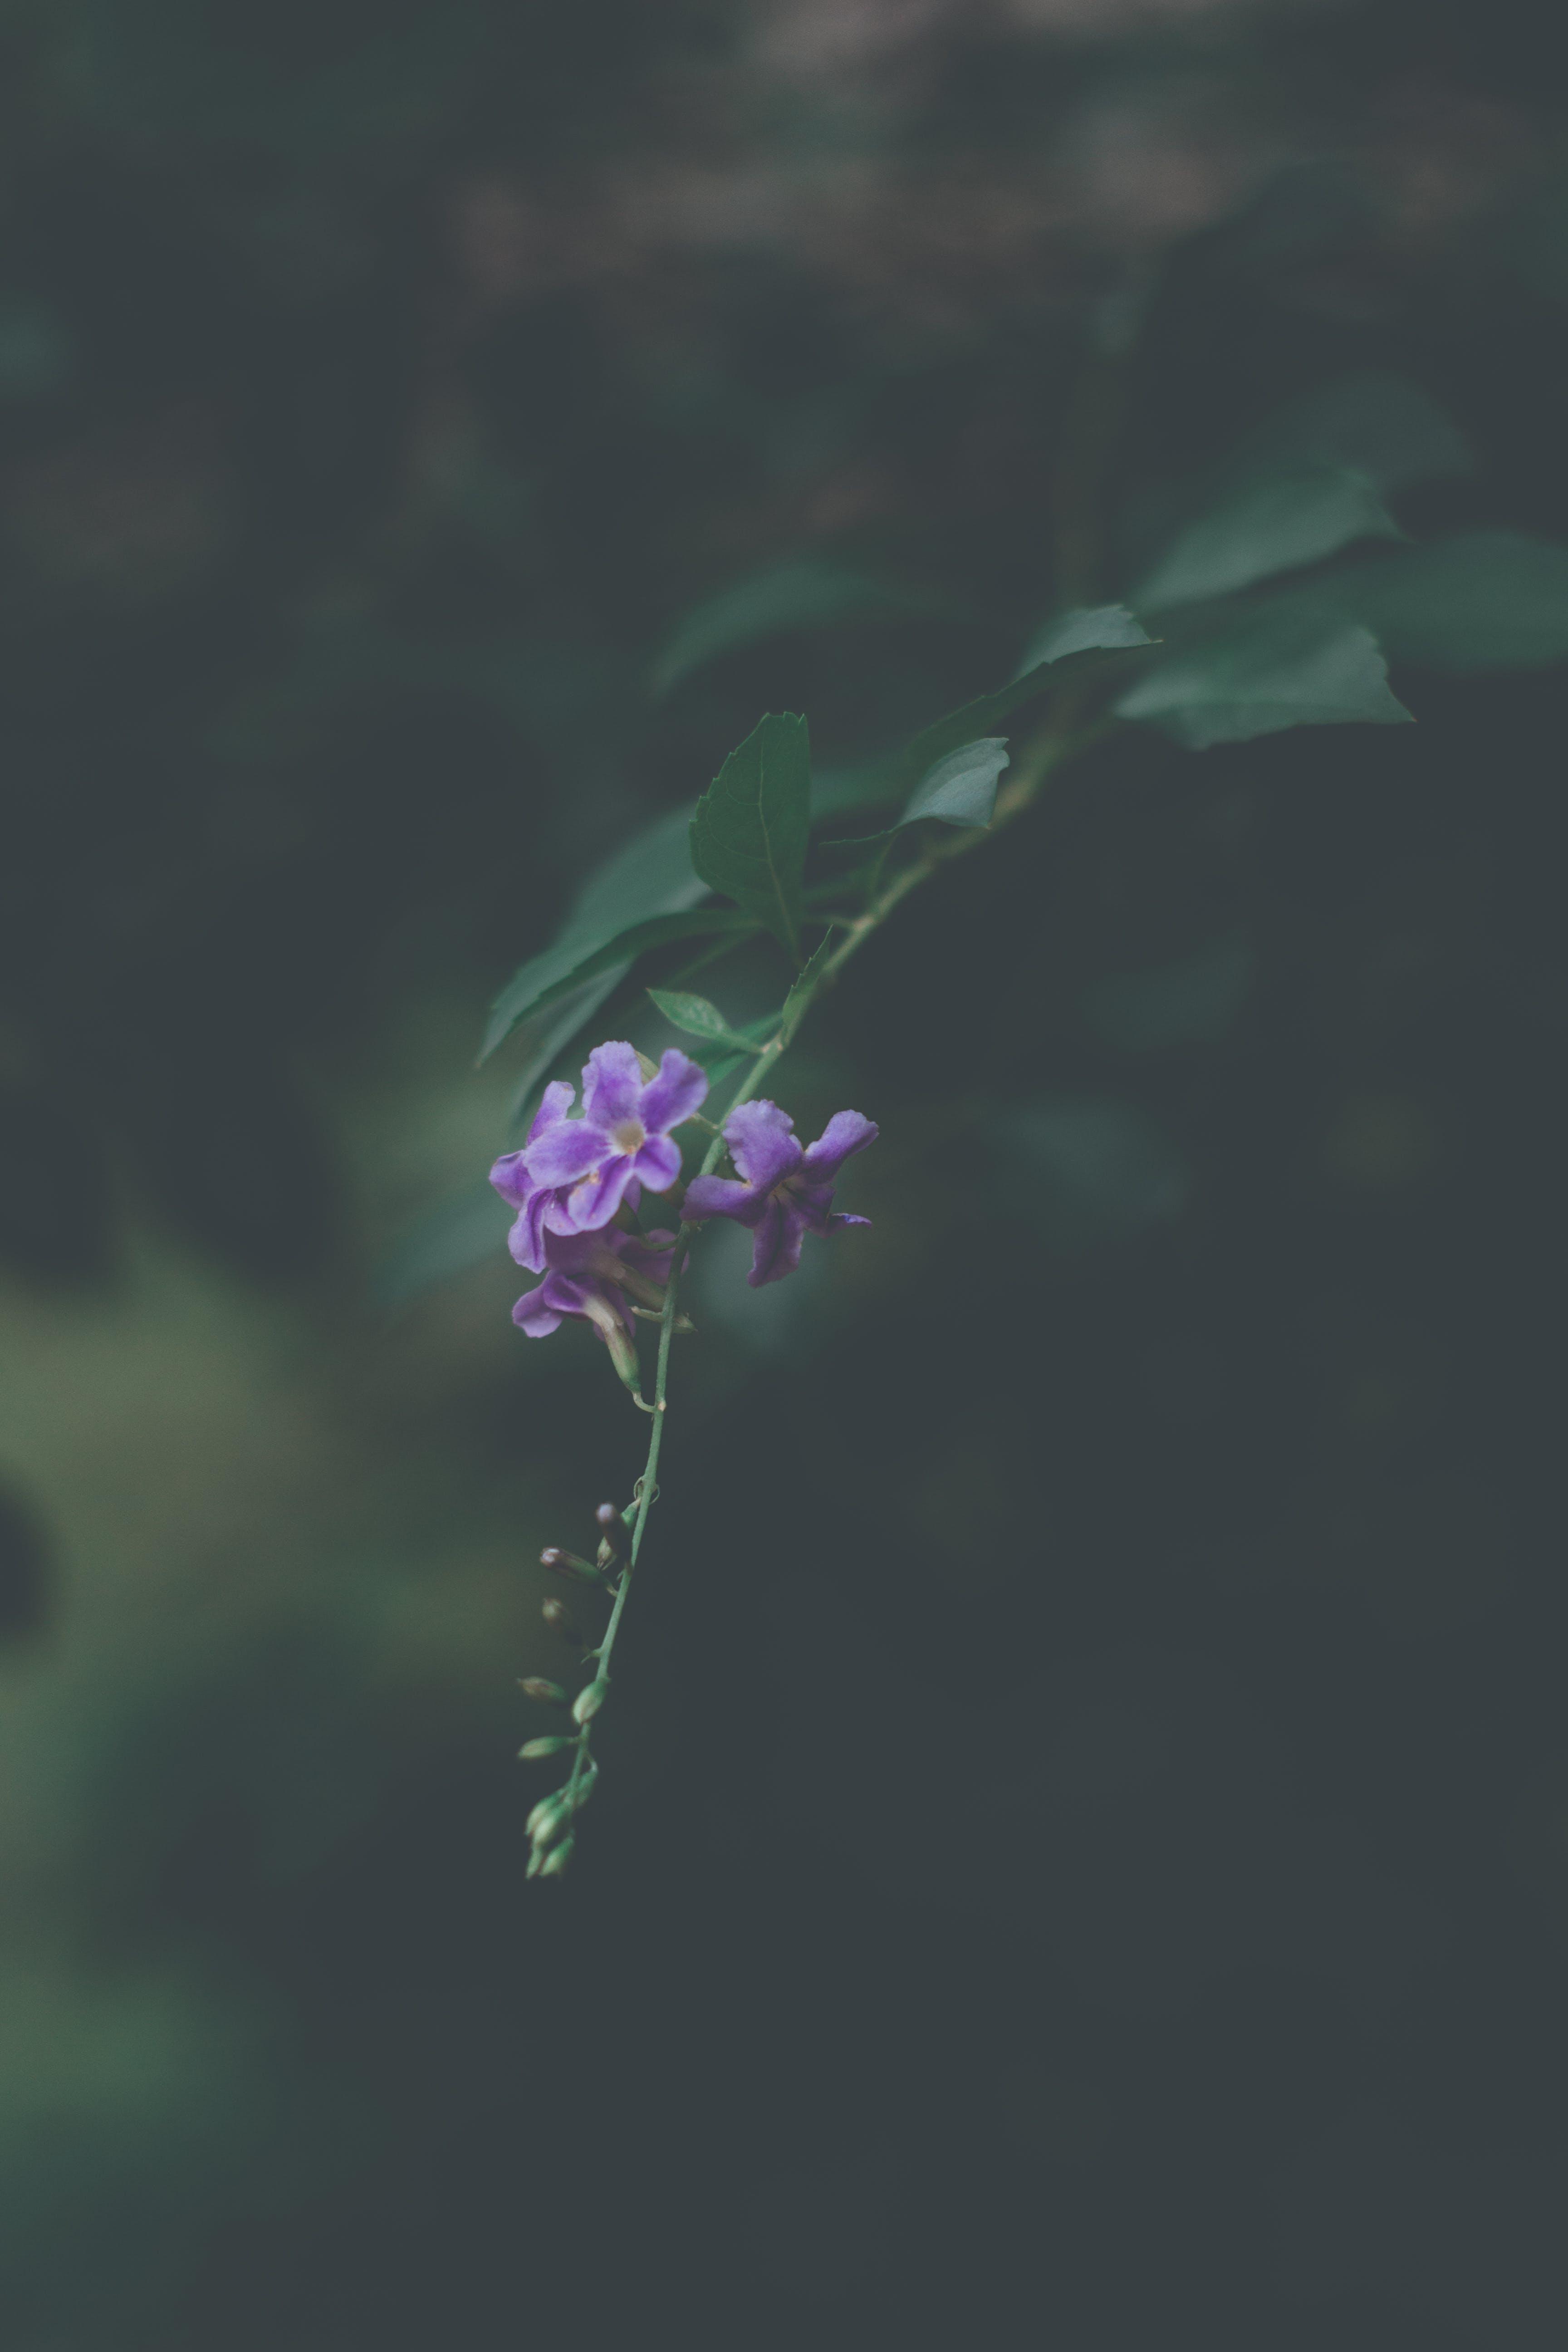 Kostenloses Stock Foto zu natur, blütenblätter, blatt, blume